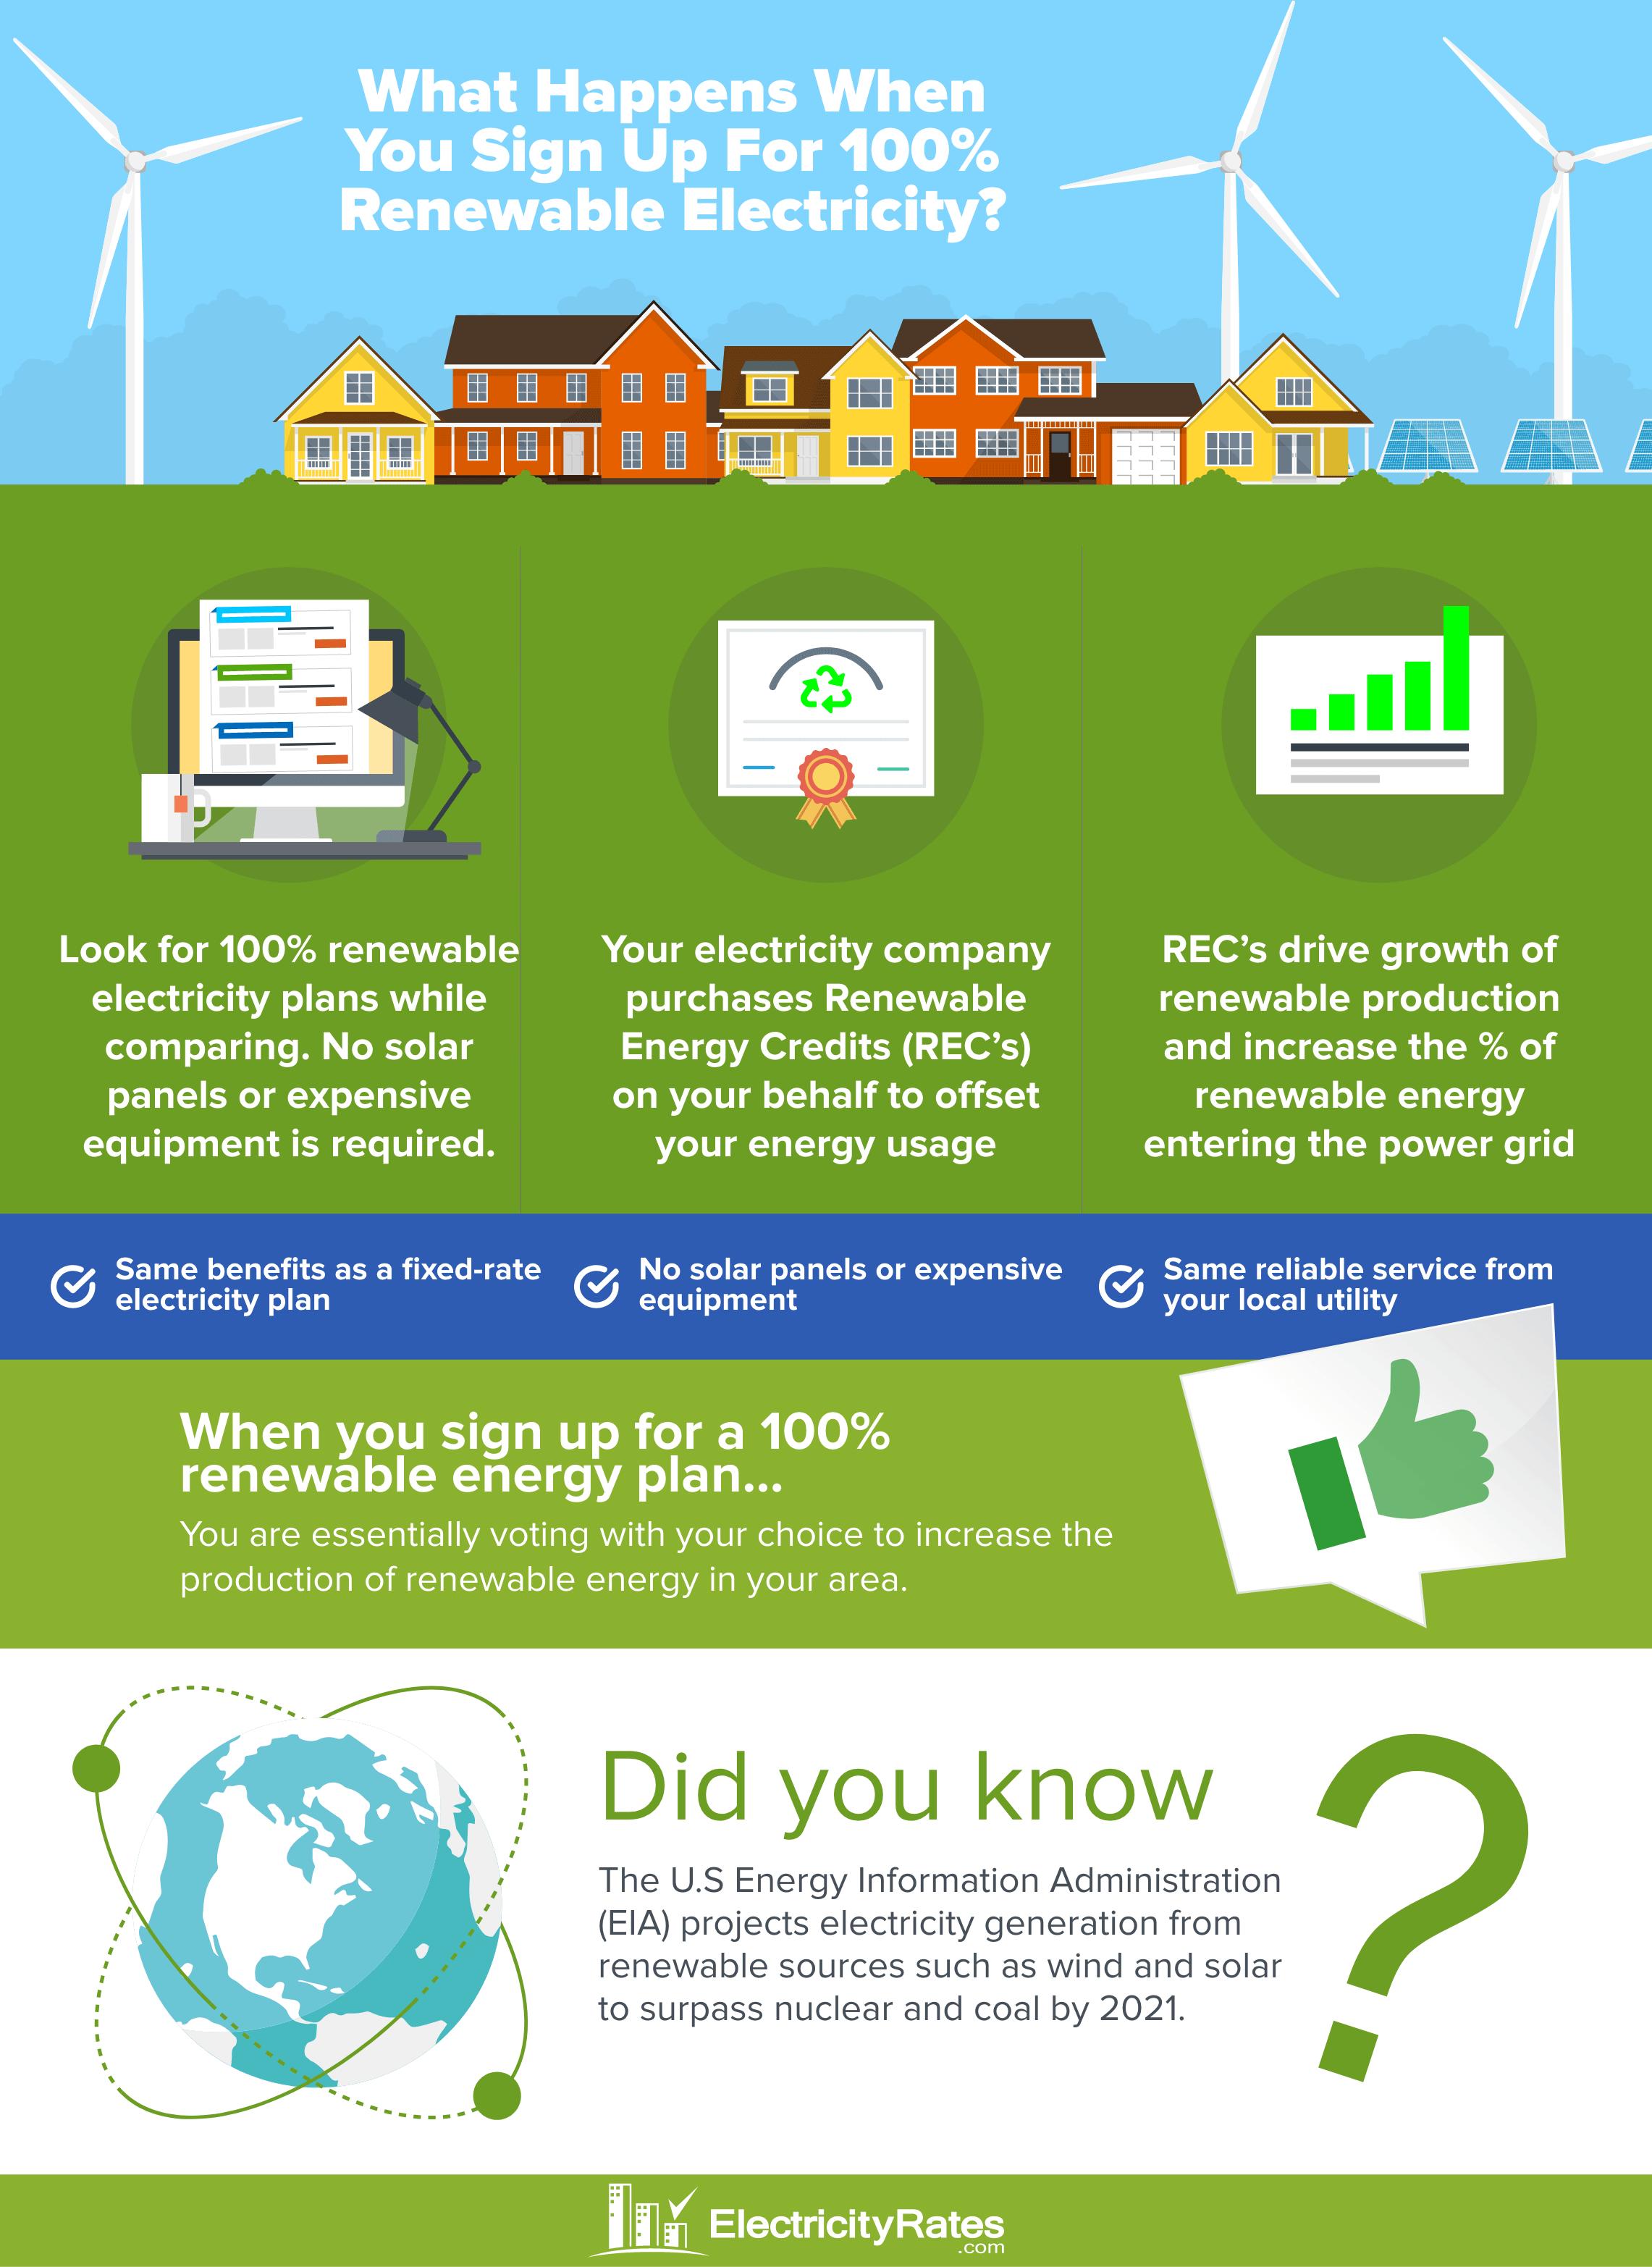 How renewable energy plans work